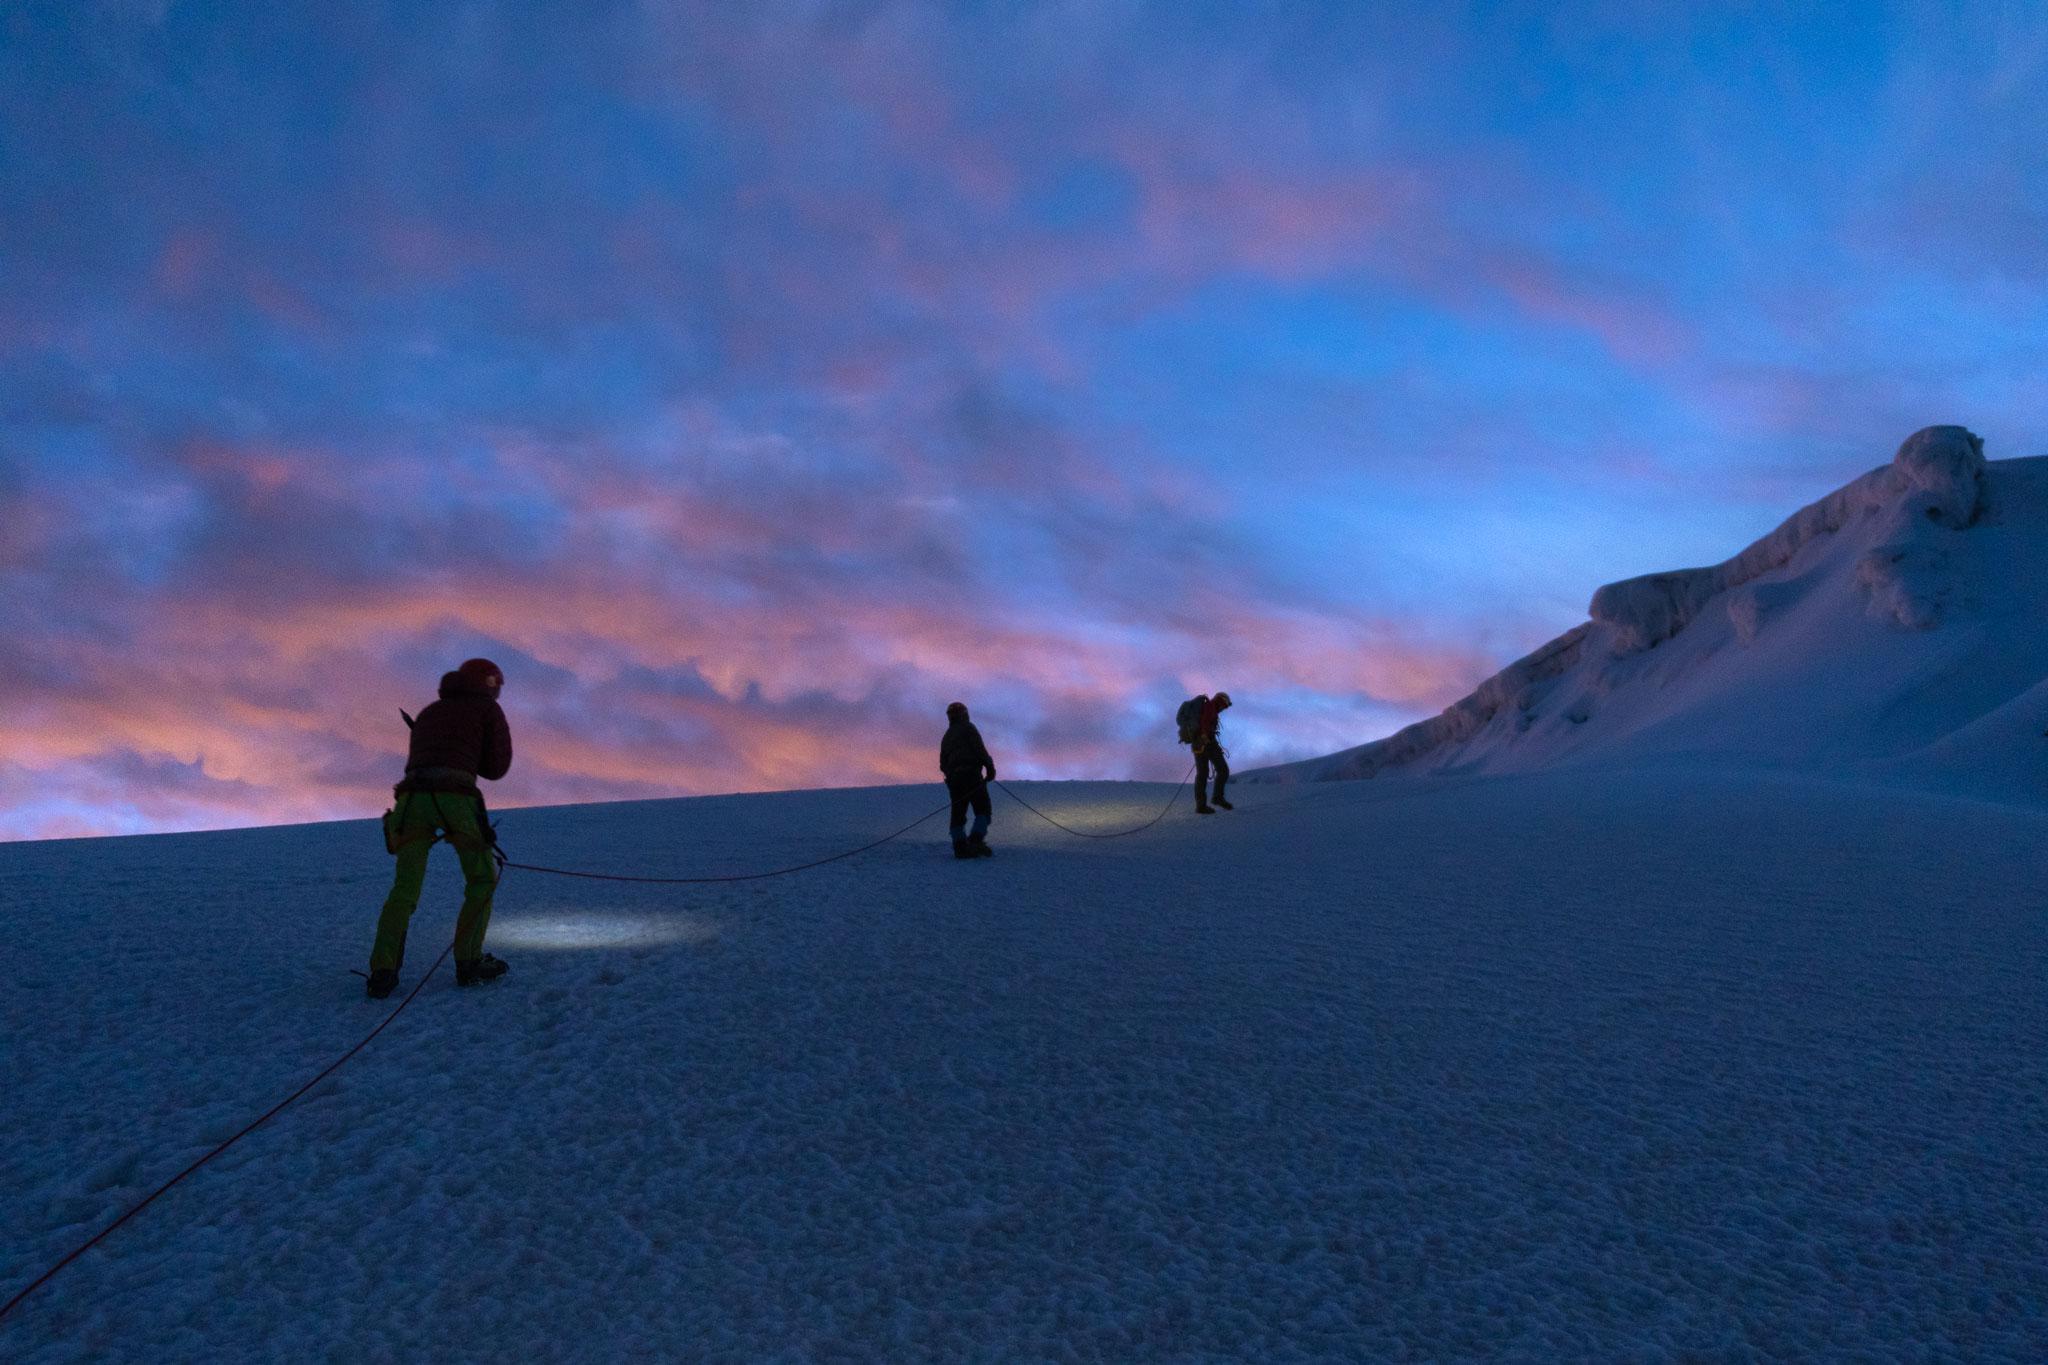 climbing-tolima-parque-nevados